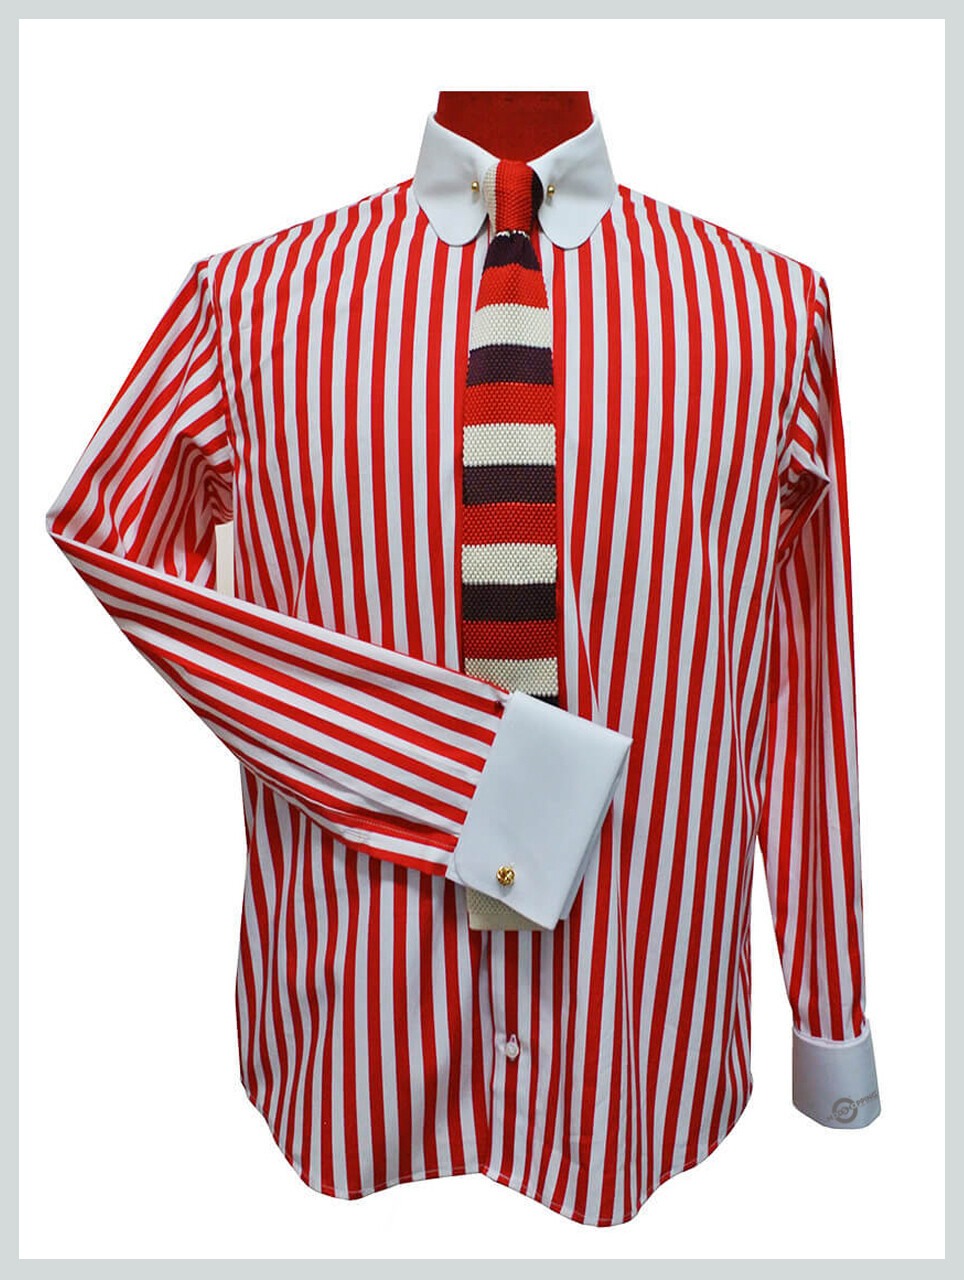 Penny Collar Shirt| Red Stripe Round Collar Mod Shirt Uk